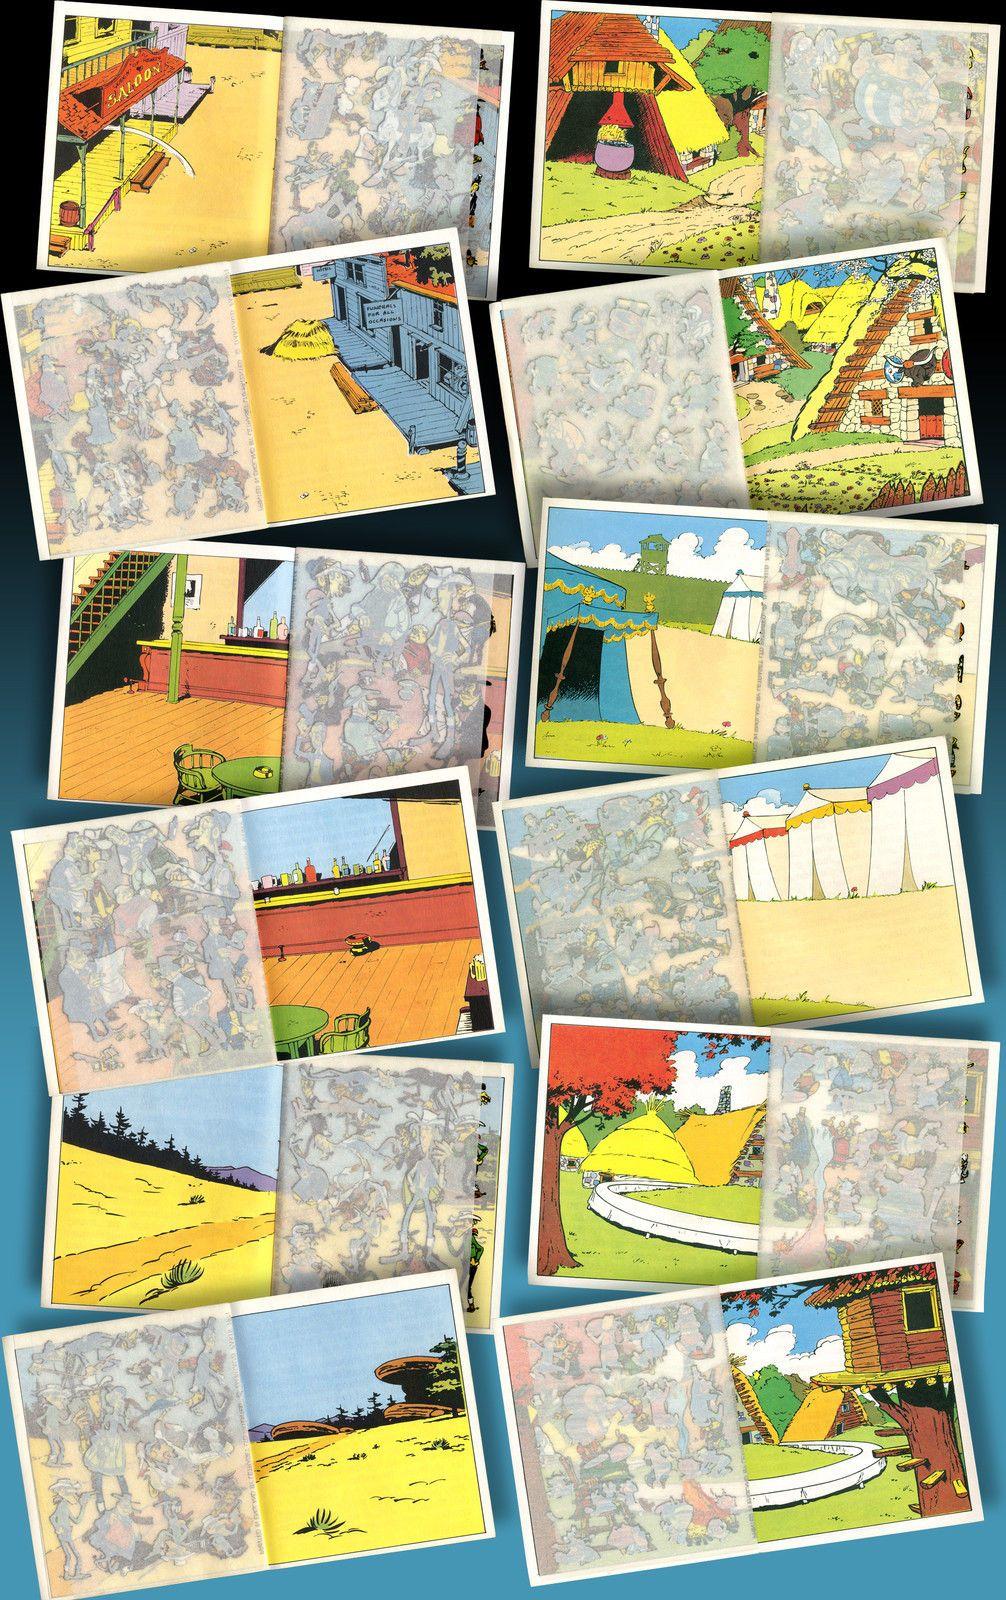 Rubbelbild Heftchen Mini Bucher Asterix Luky Luke 1971 In Box Americana Kalkitos Childhood Retro Quilts